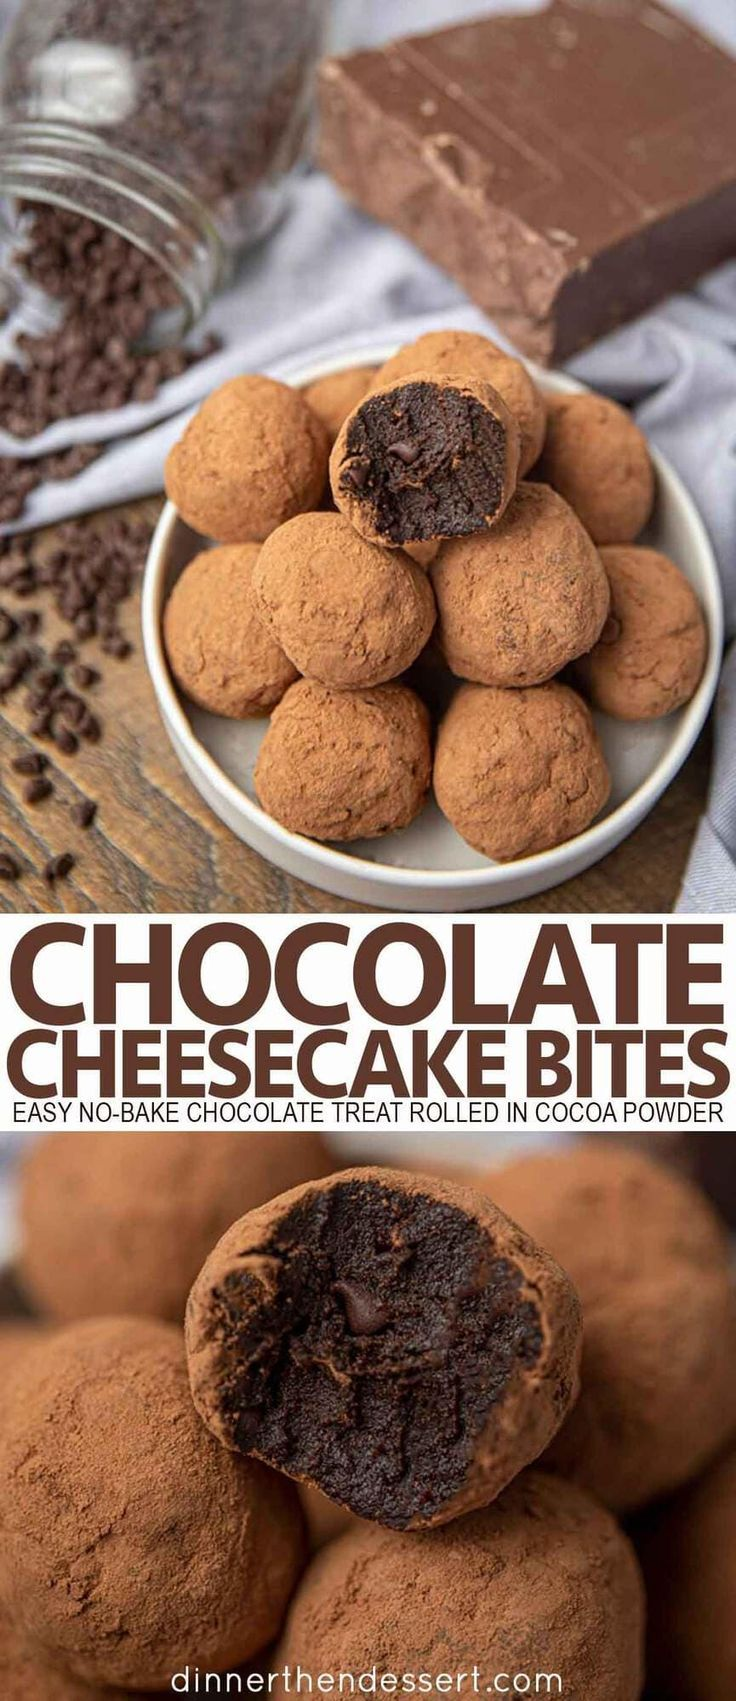 Chocolate cheesecake bites is an easy nobake treat made